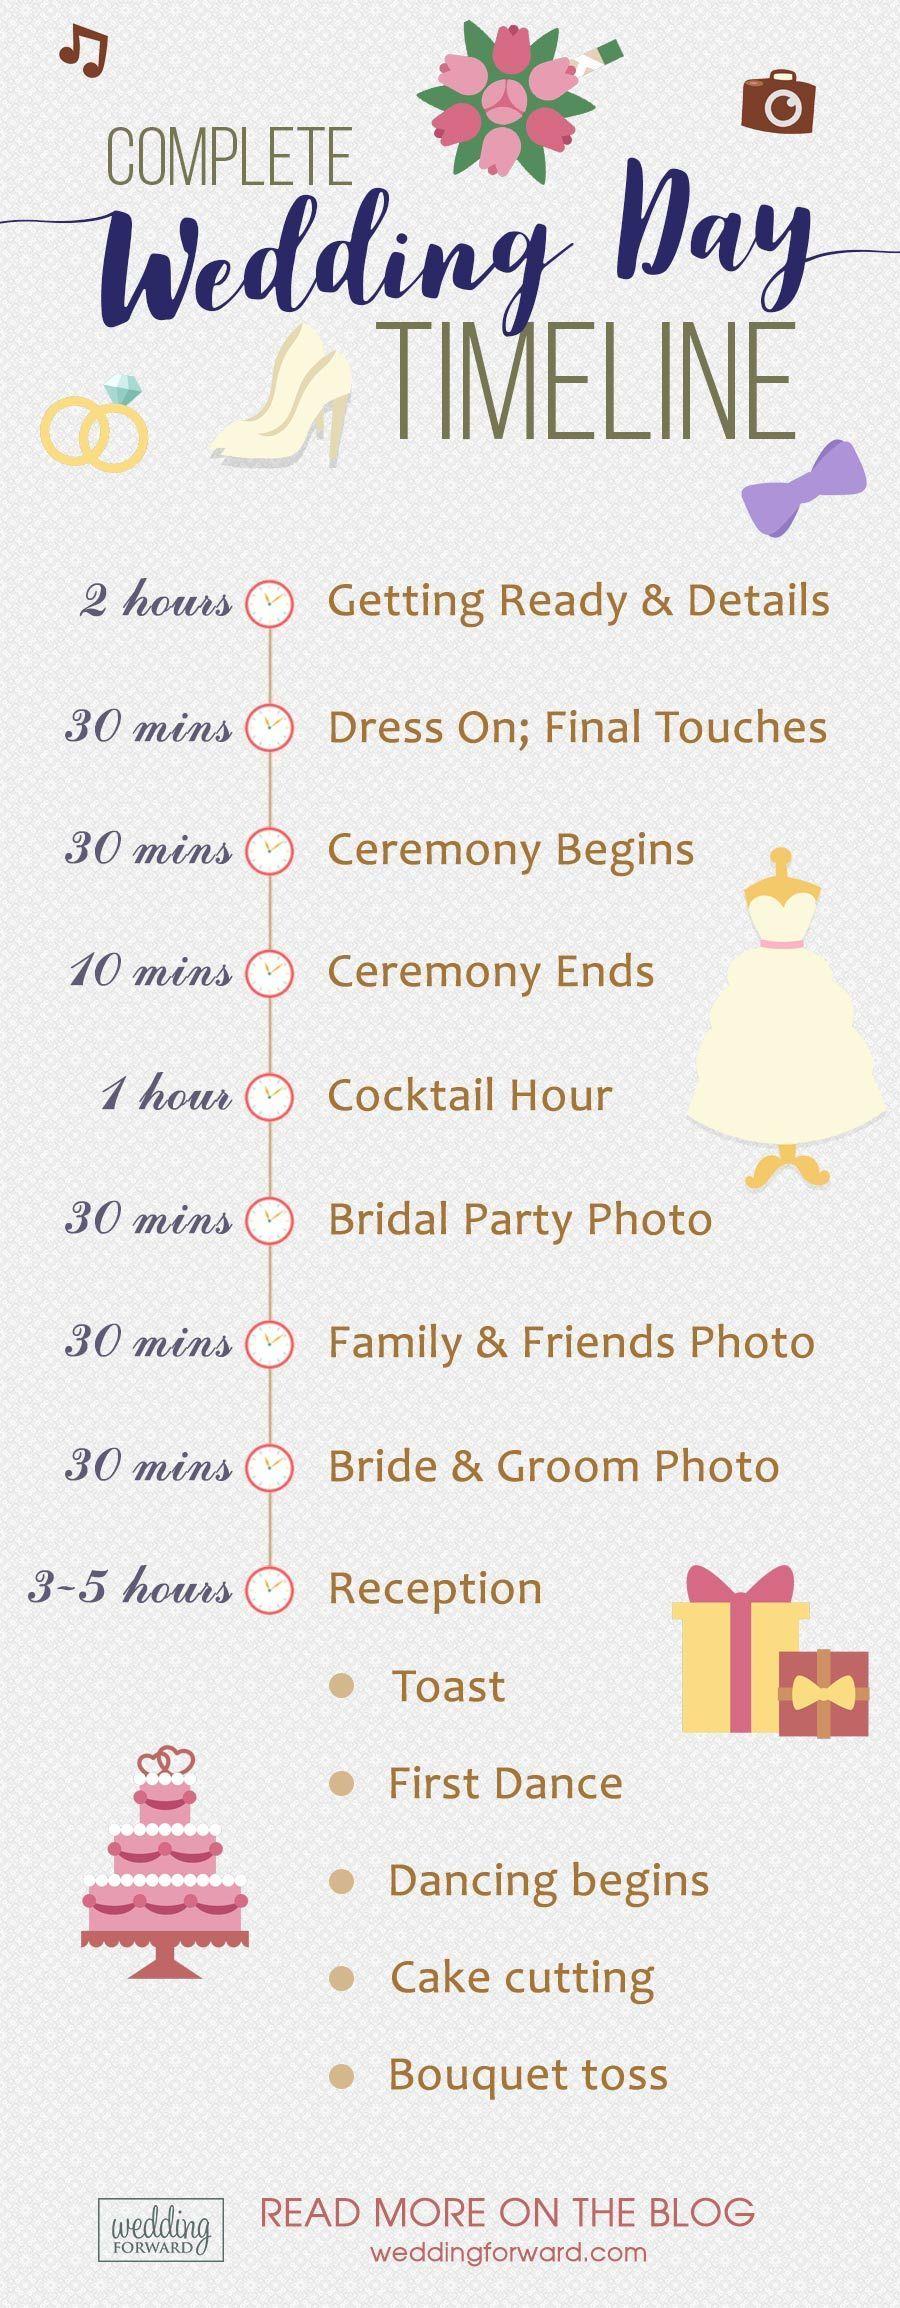 Complete Wedding Day Timeline